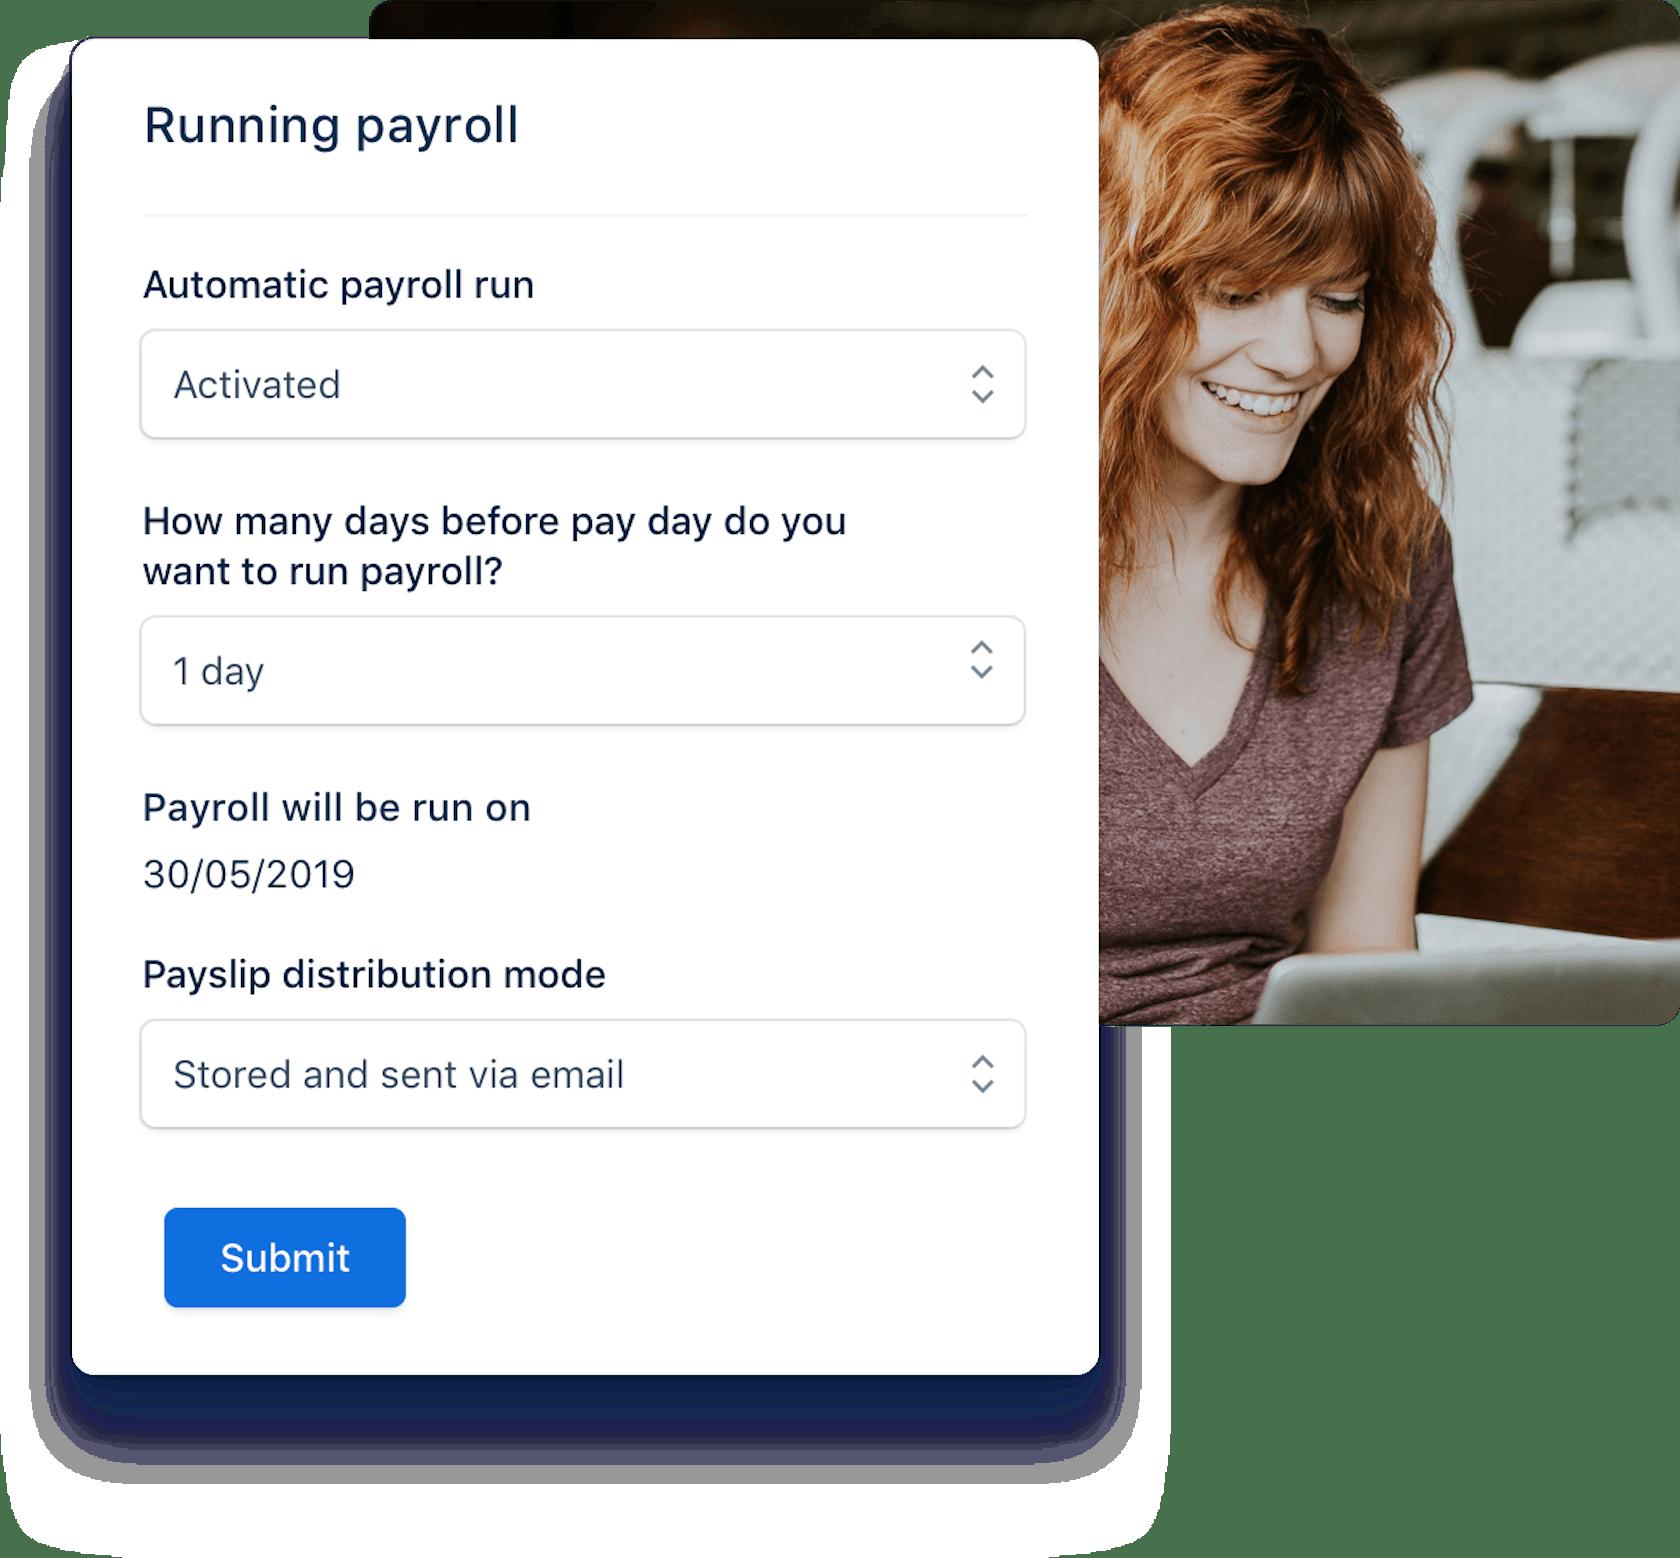 Automatic payroll run